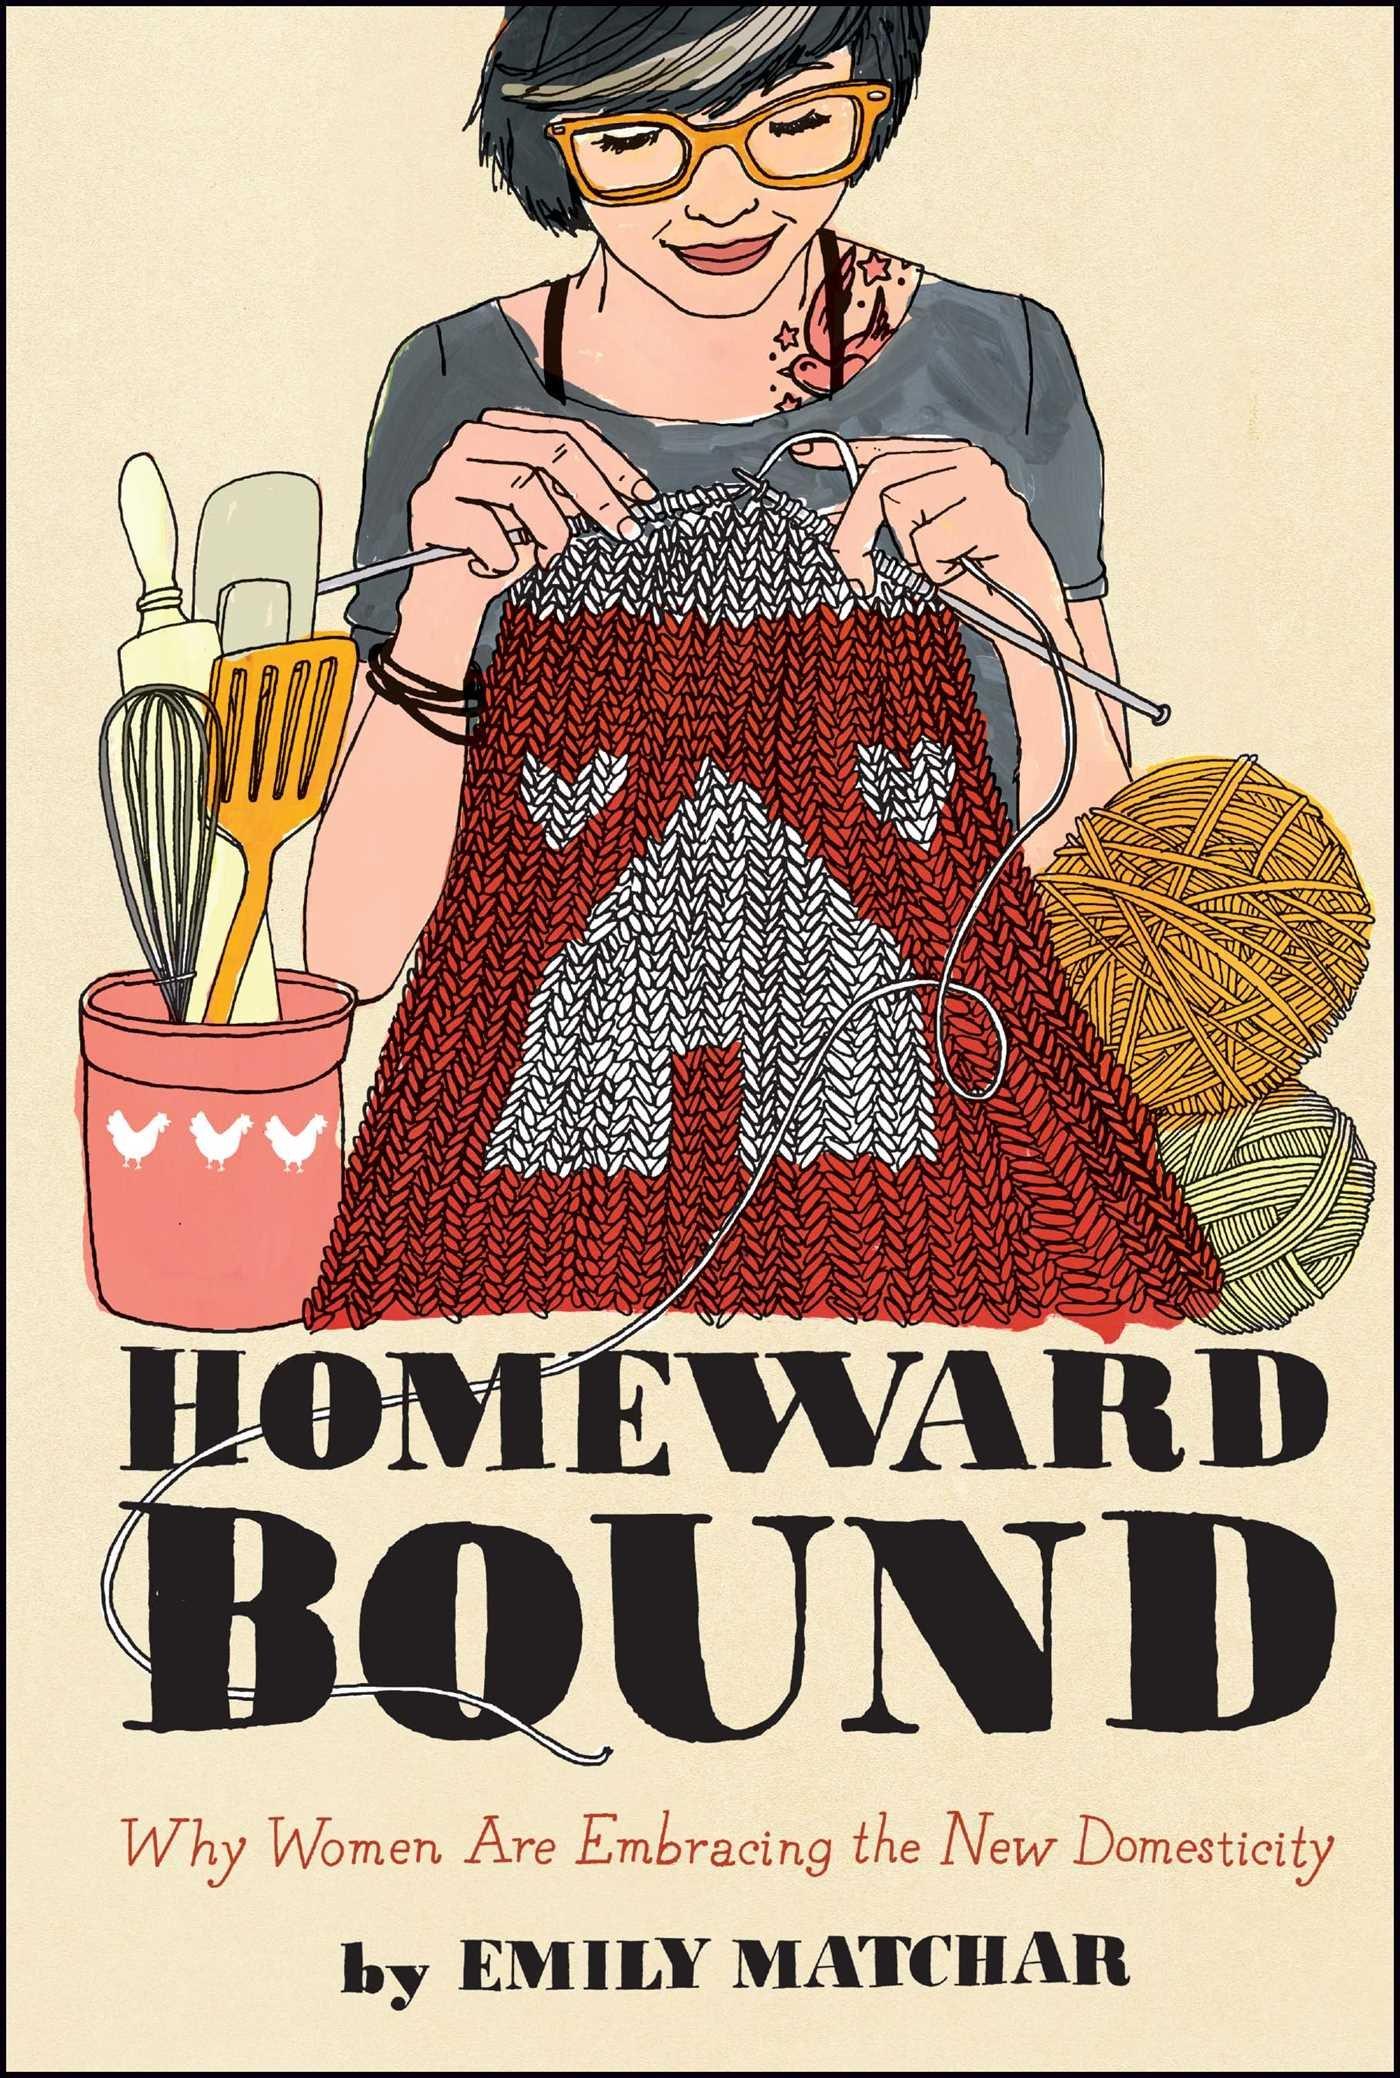 Homeward Bound: Why Women Are Embracing the New Domesticity (Night Glow  Board Books): Emily Matchar: 9781451665451: Amazon.com: Books